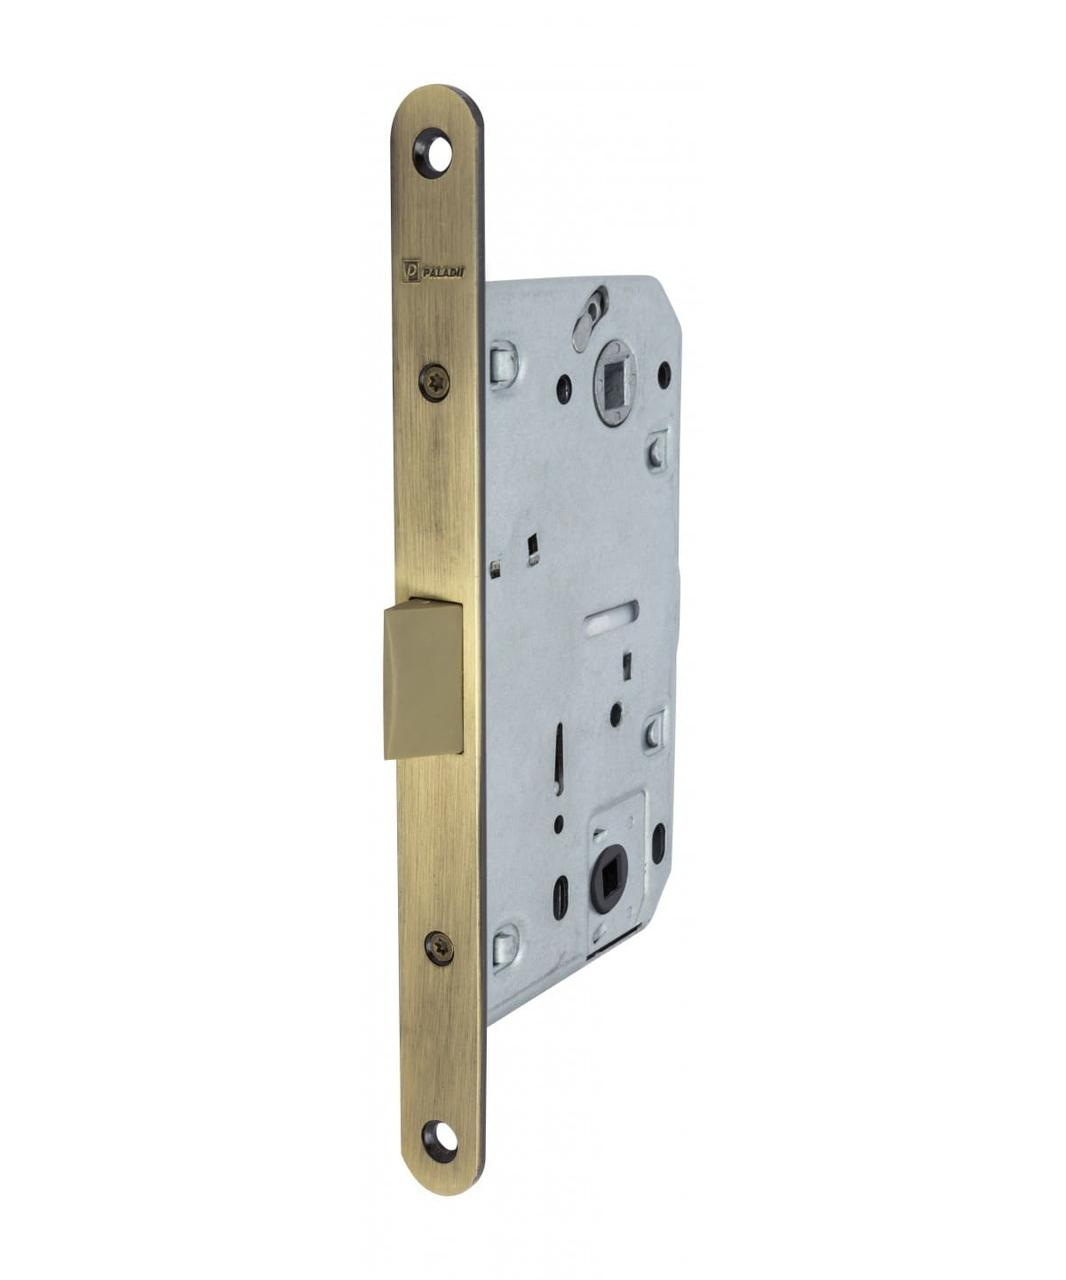 Механизм межкомнатный  Paladii 96*50*18мм WC 410B PVC-1 Kevlar AB бронза